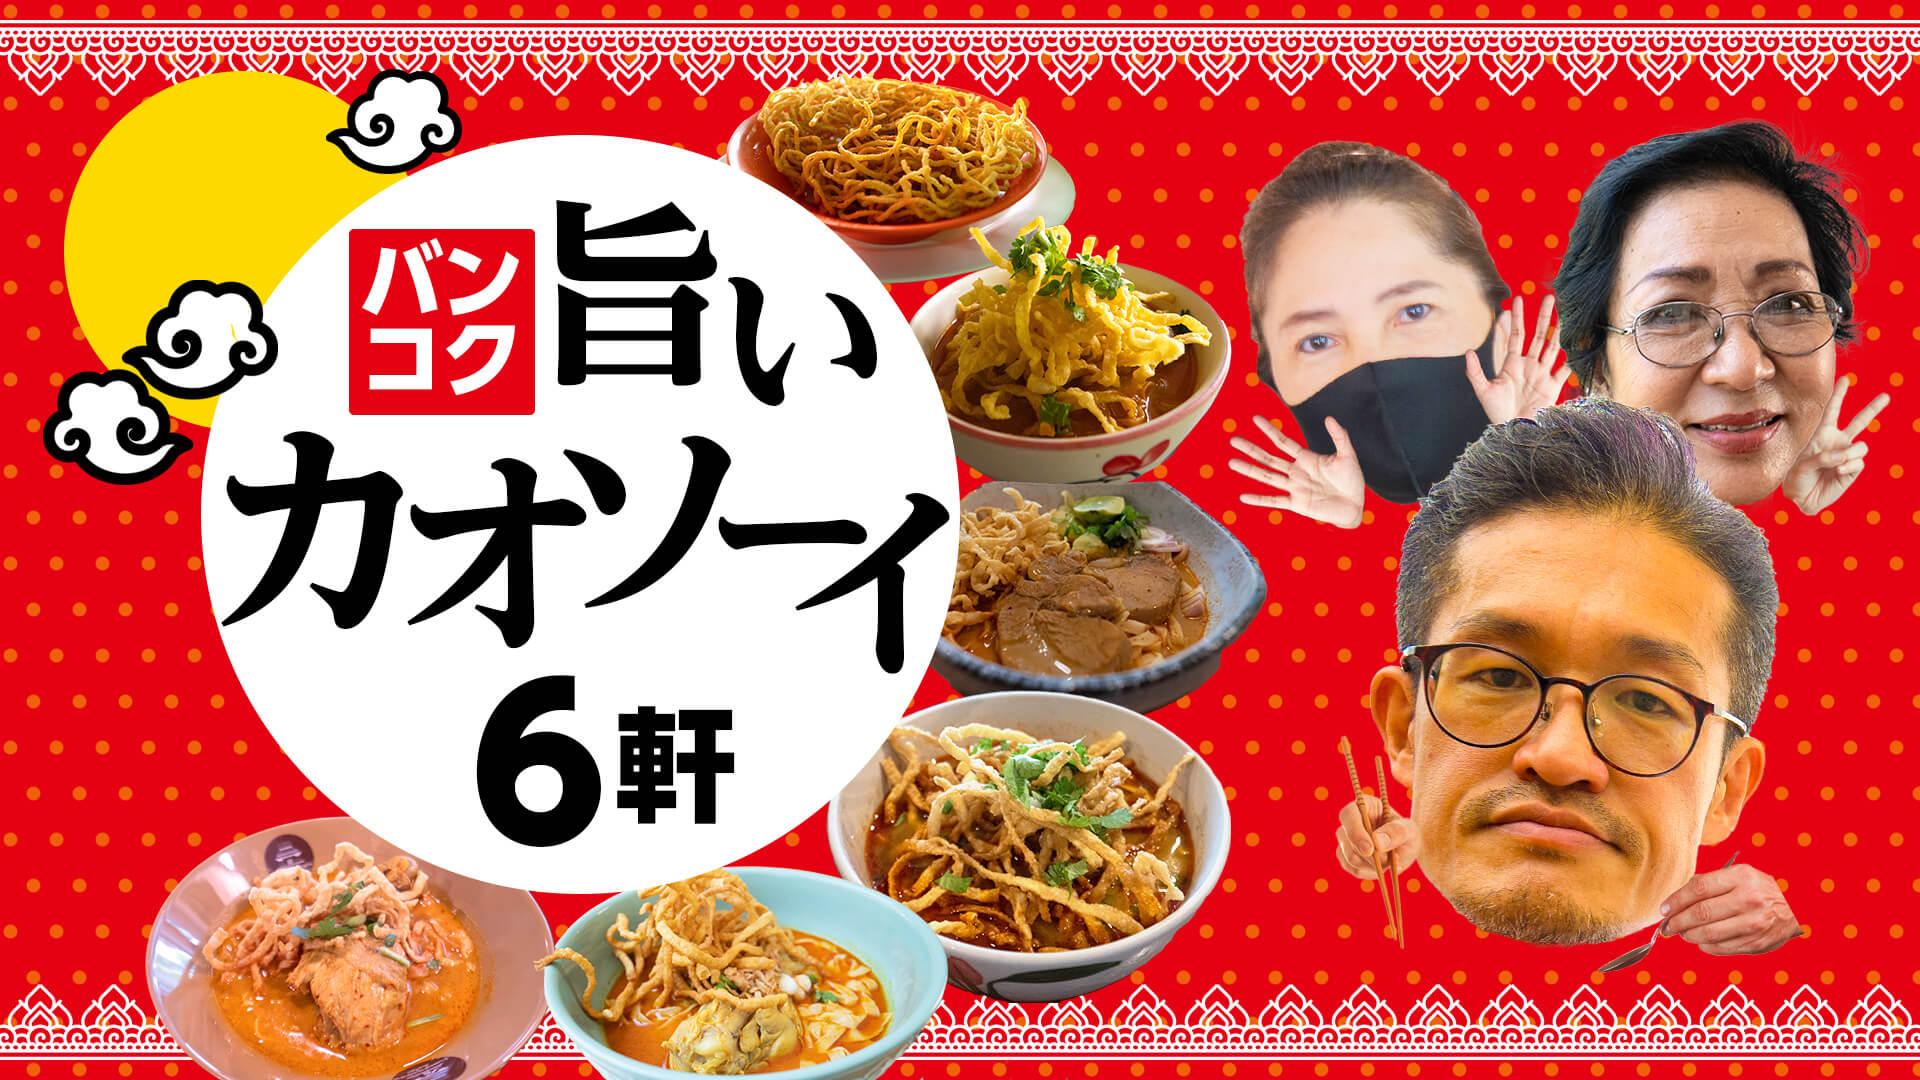 YouTubeチャンネル 西尾康晴/Nishio Travel カオソーイ特集用アイキャッチ画像